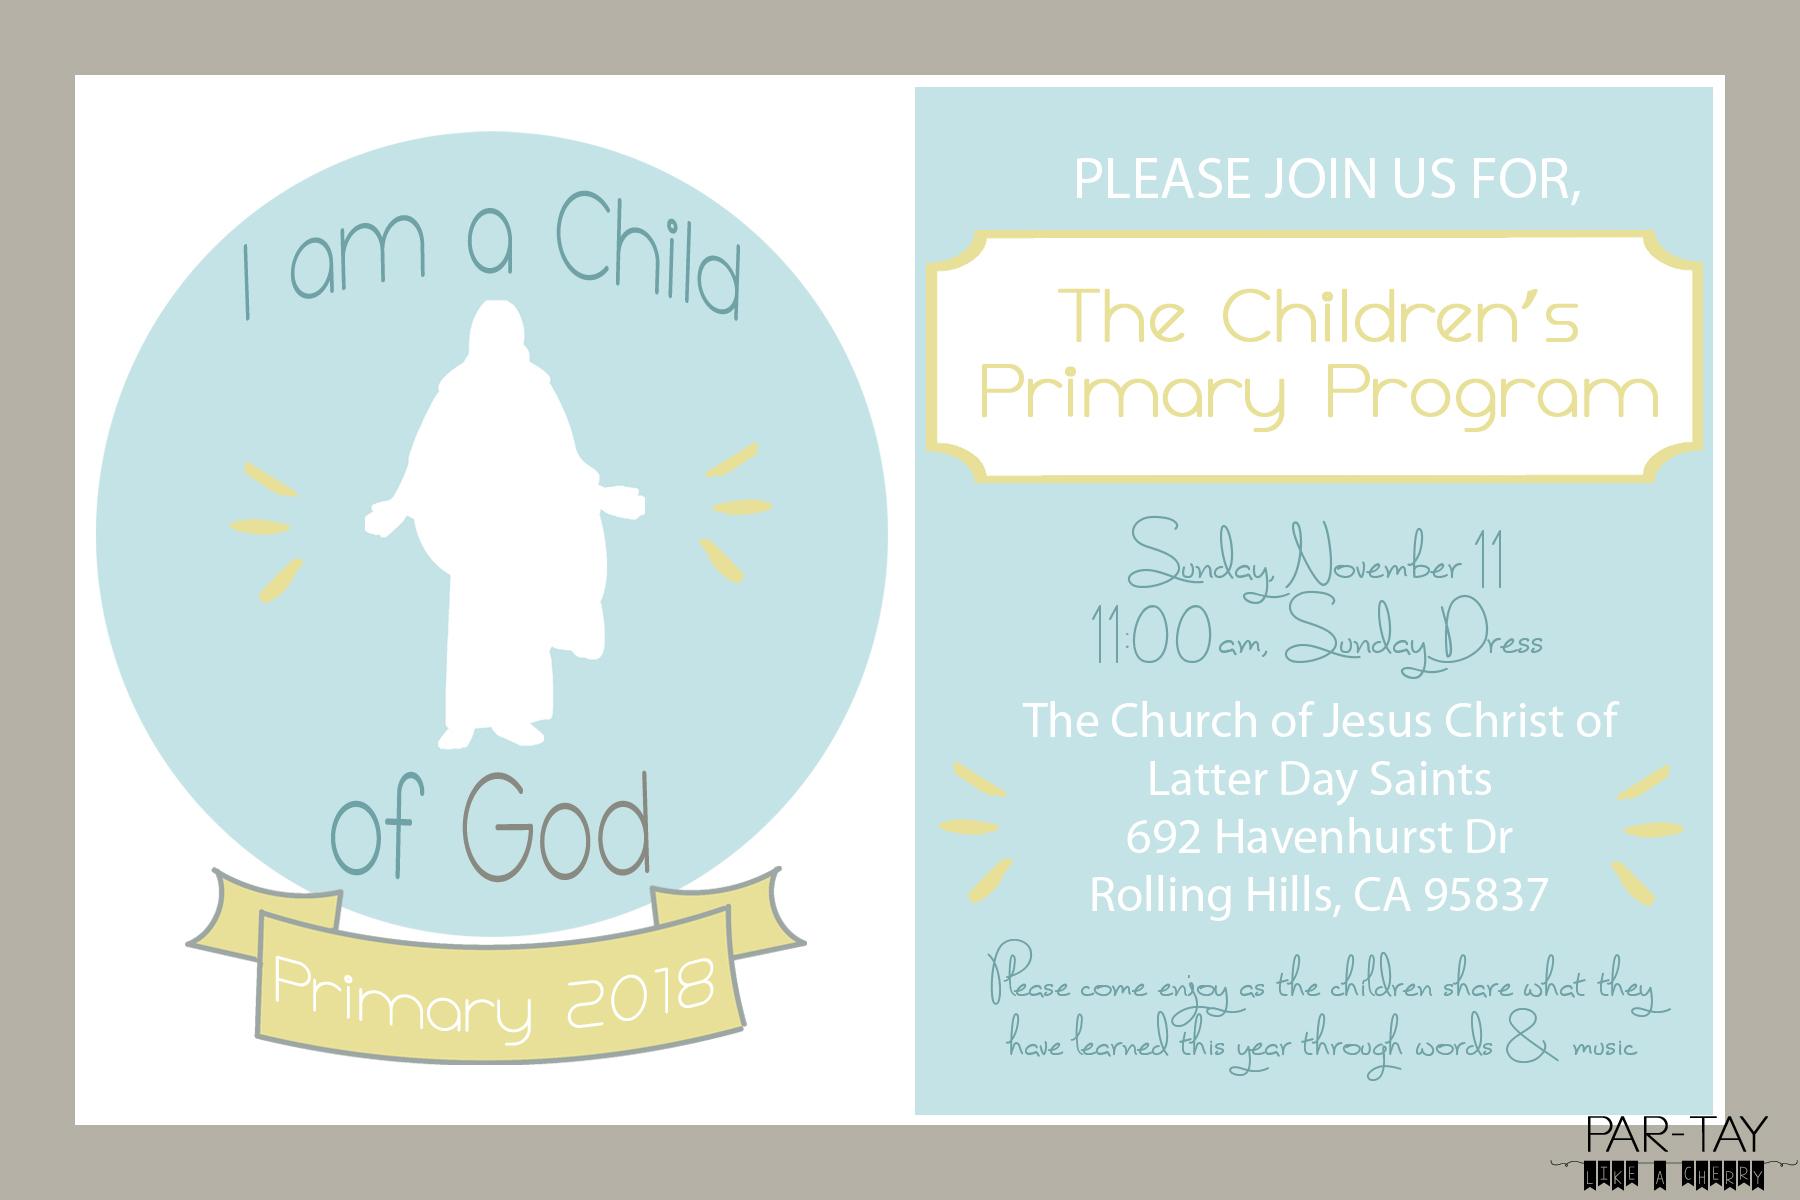 2018 Primary Program Invitation Party Like A Cherry